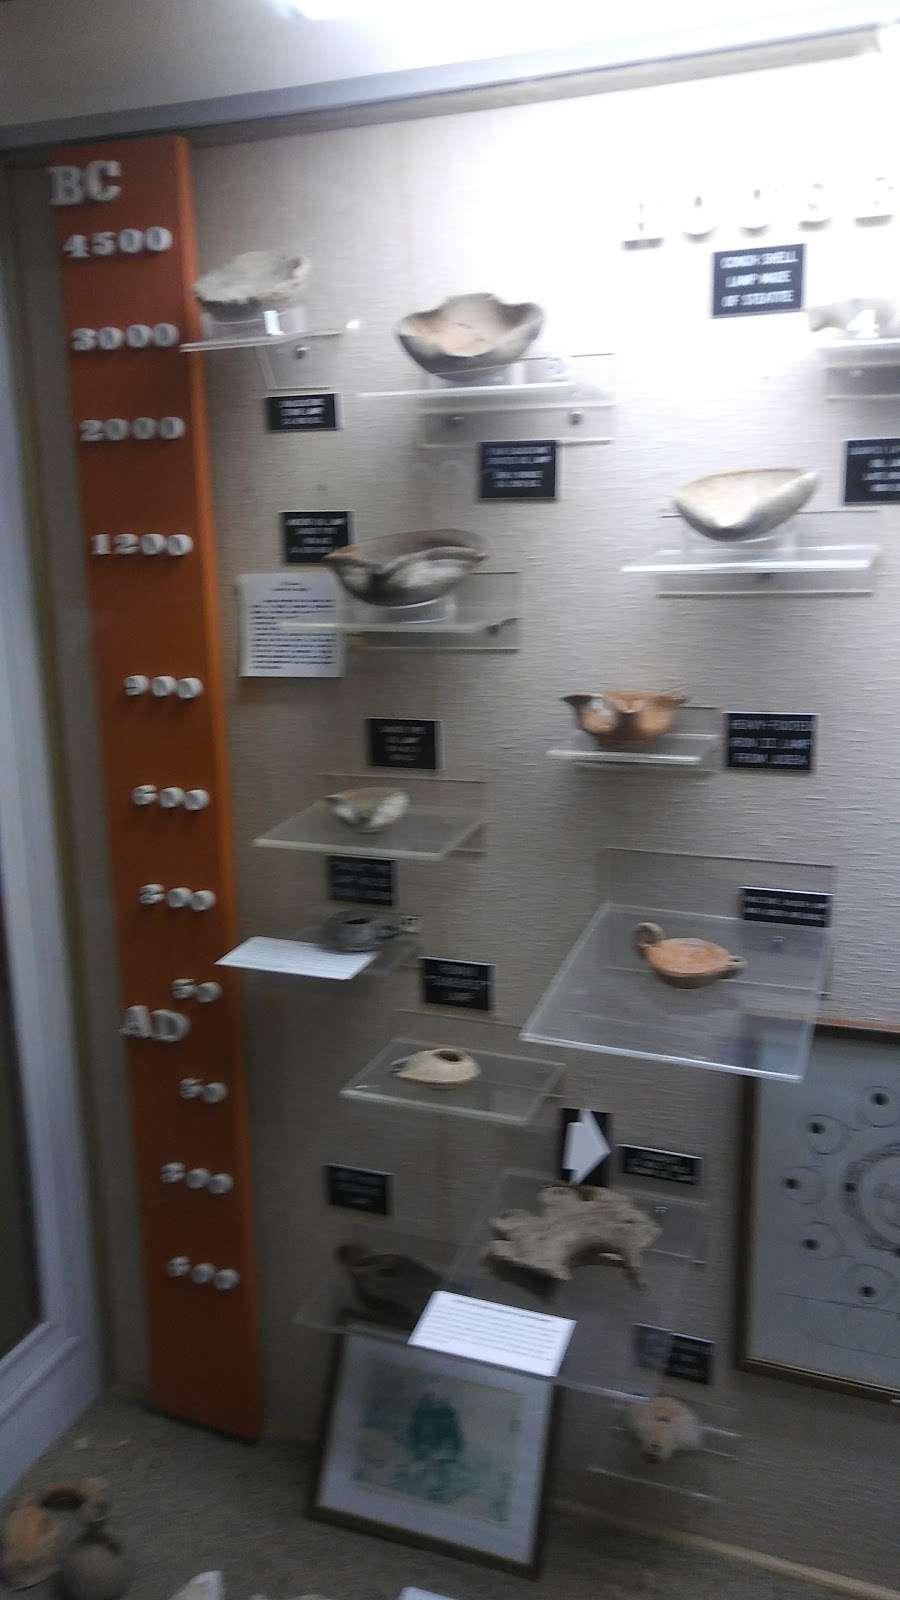 Jeeninga Museum - museum  | Photo 1 of 5 | Address: 1123 Anderson University Blvd, Anderson, IN 46012, USA | Phone: (765) 641-4526